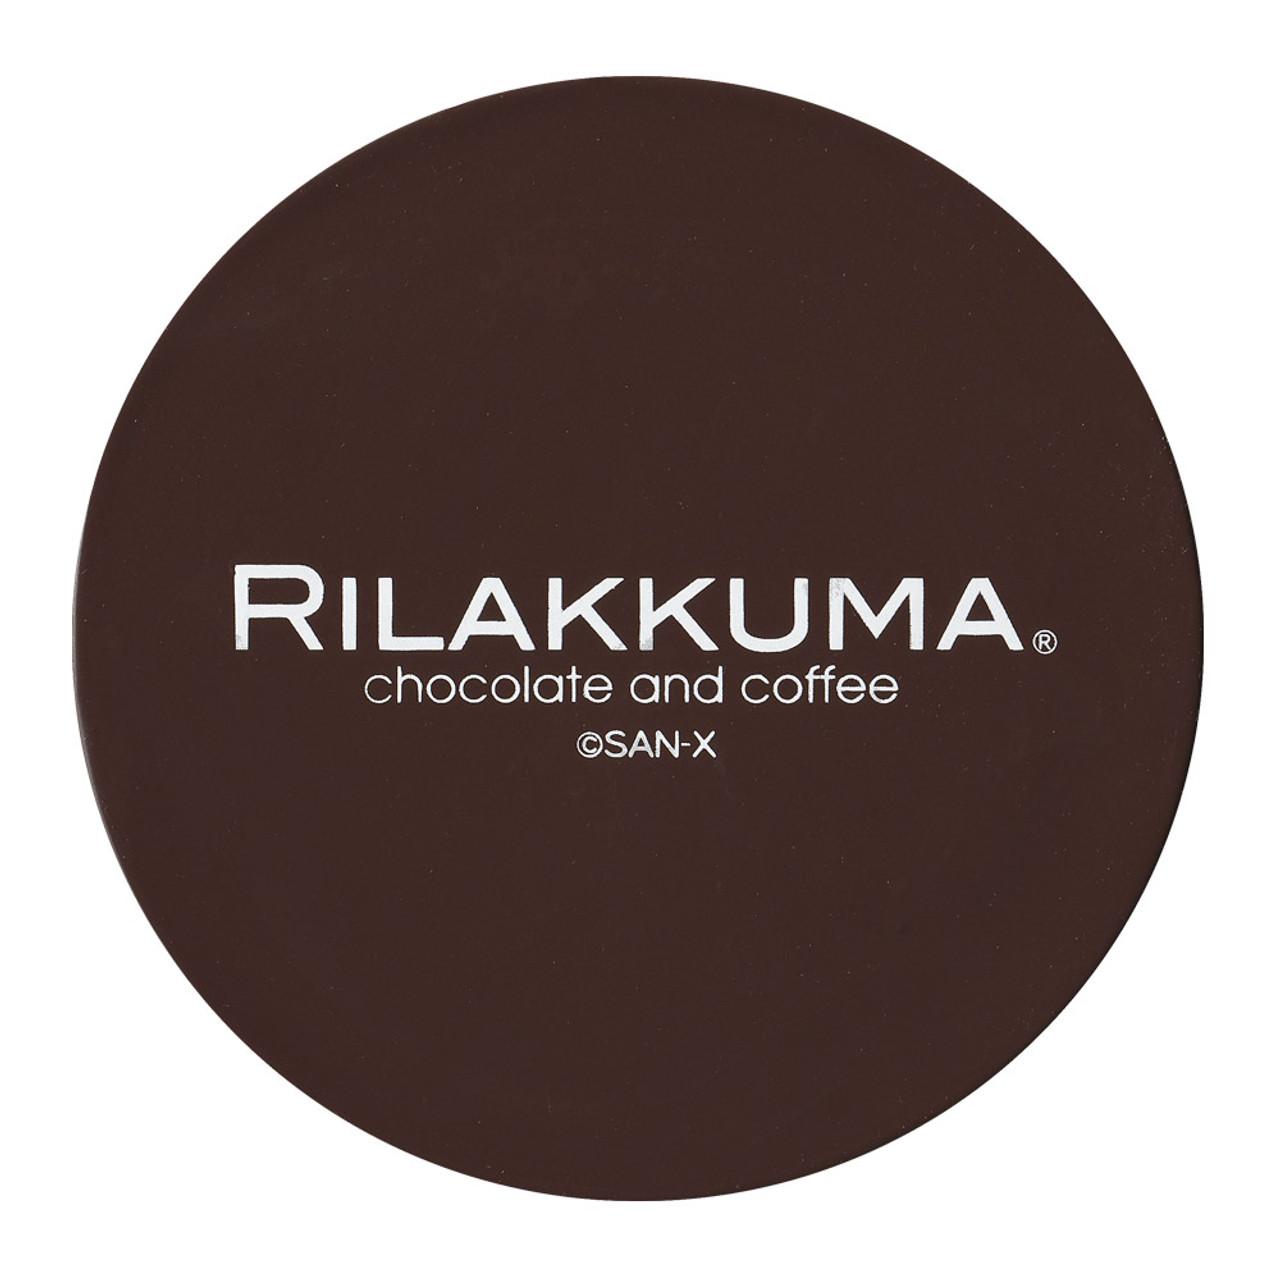 San-x Rilakkuma Circle Chocolate Coffee Mug Coaster - KY00901 ( Back View )